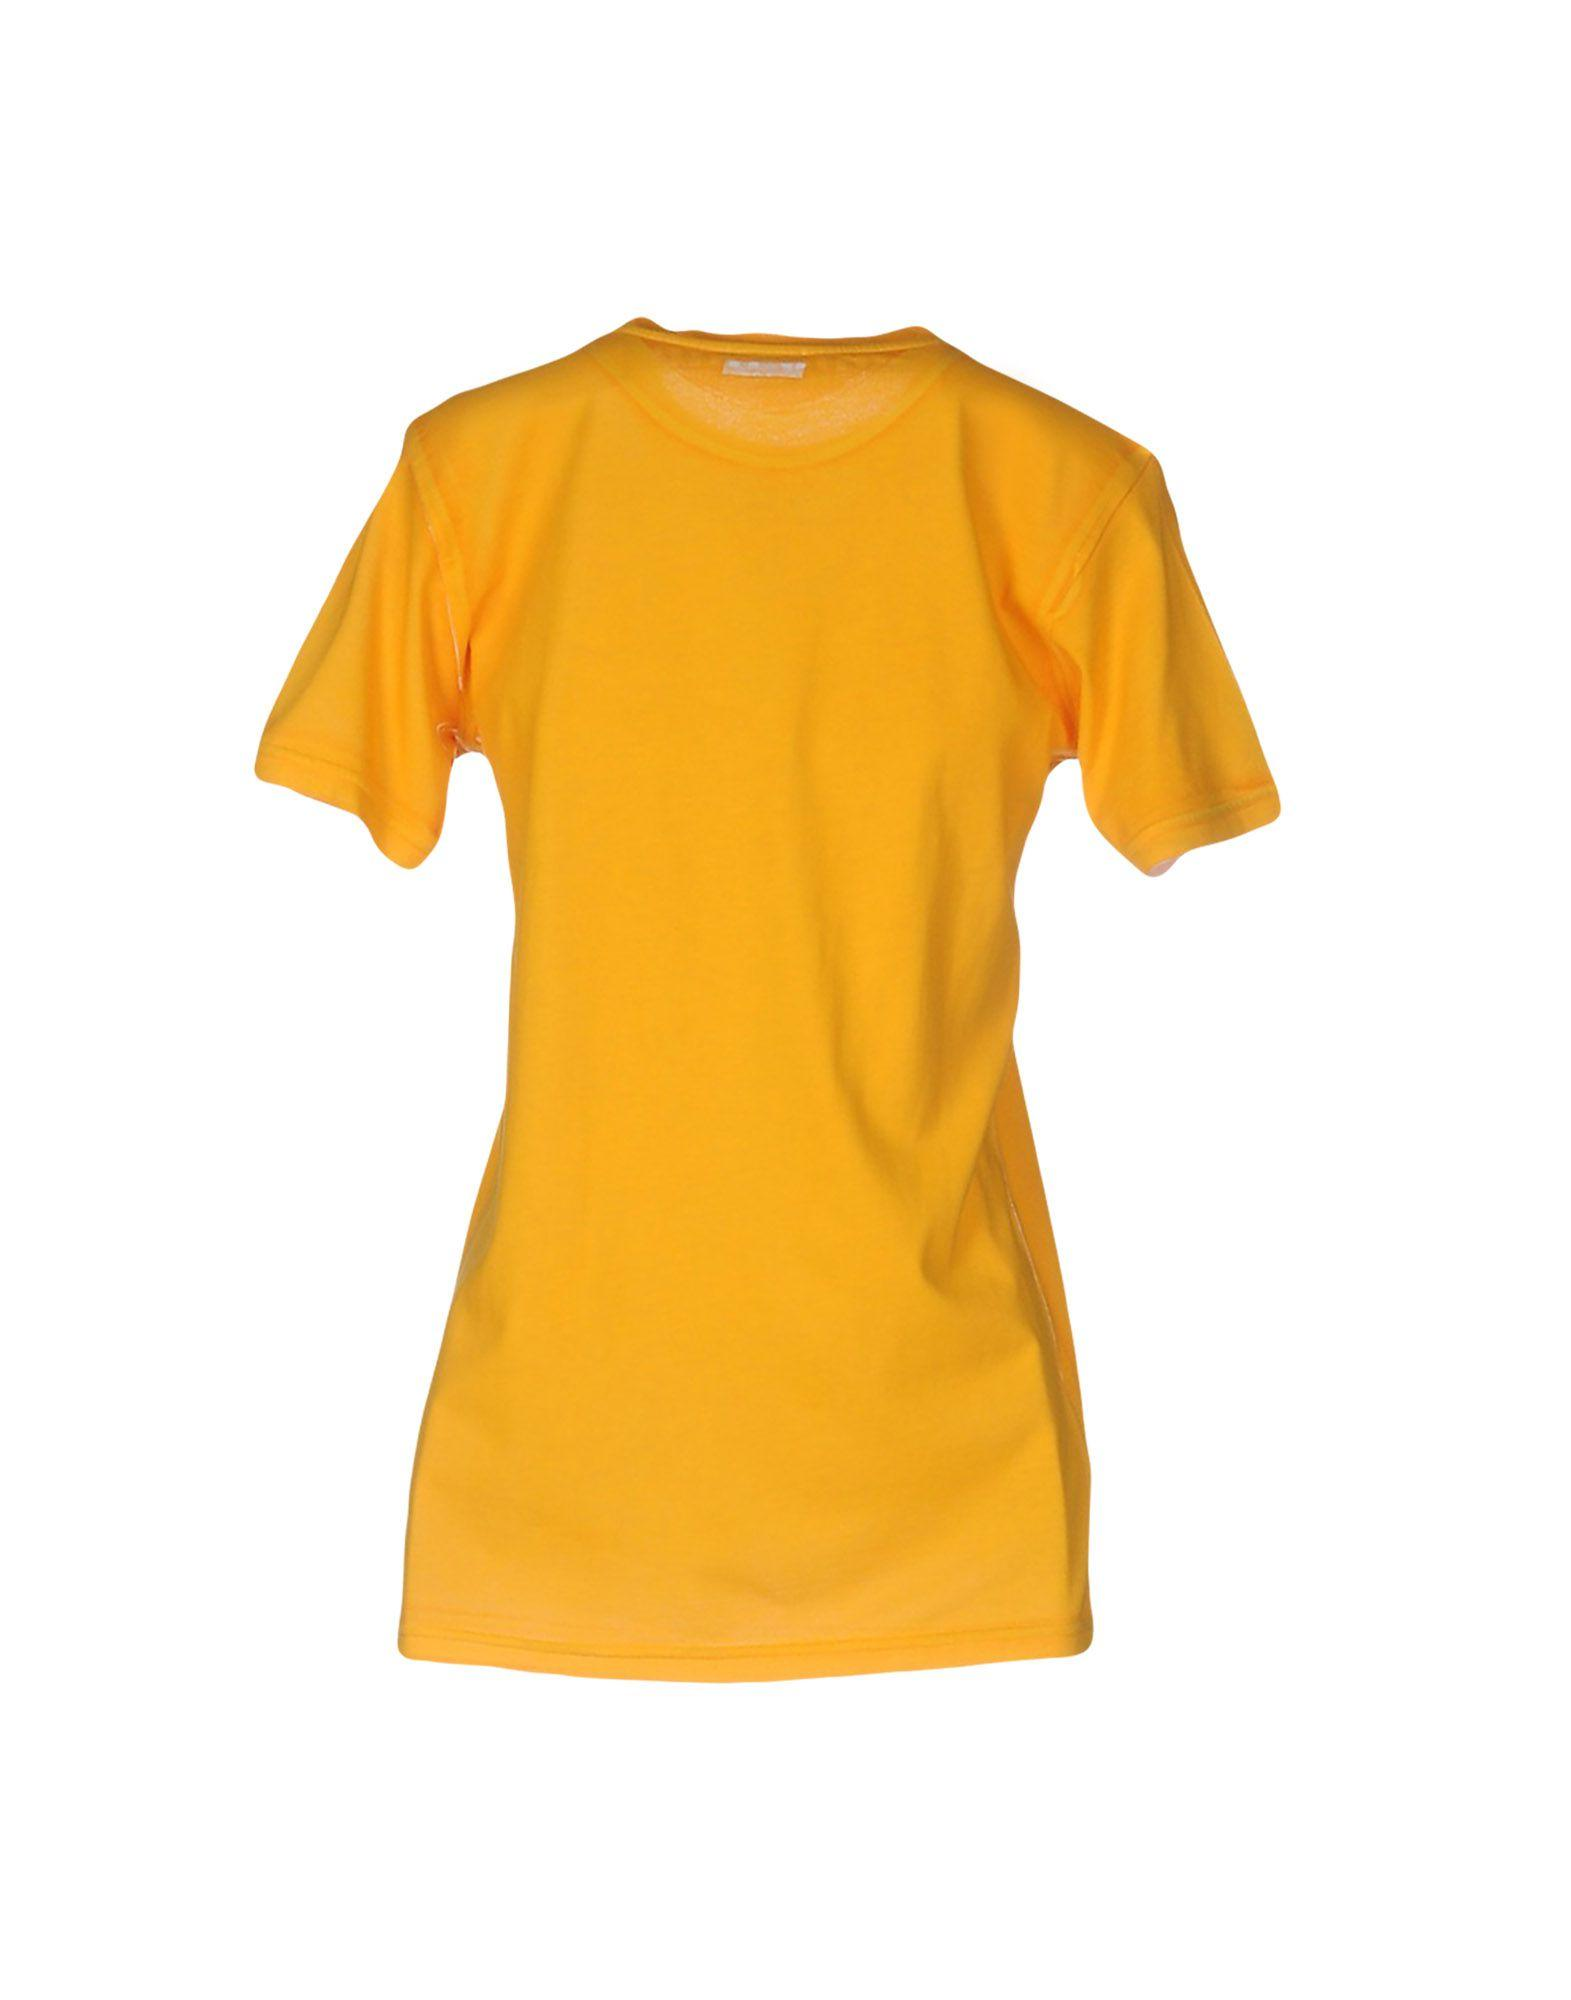 Miu miu t shirt in yellow lyst for Miu miu t shirt